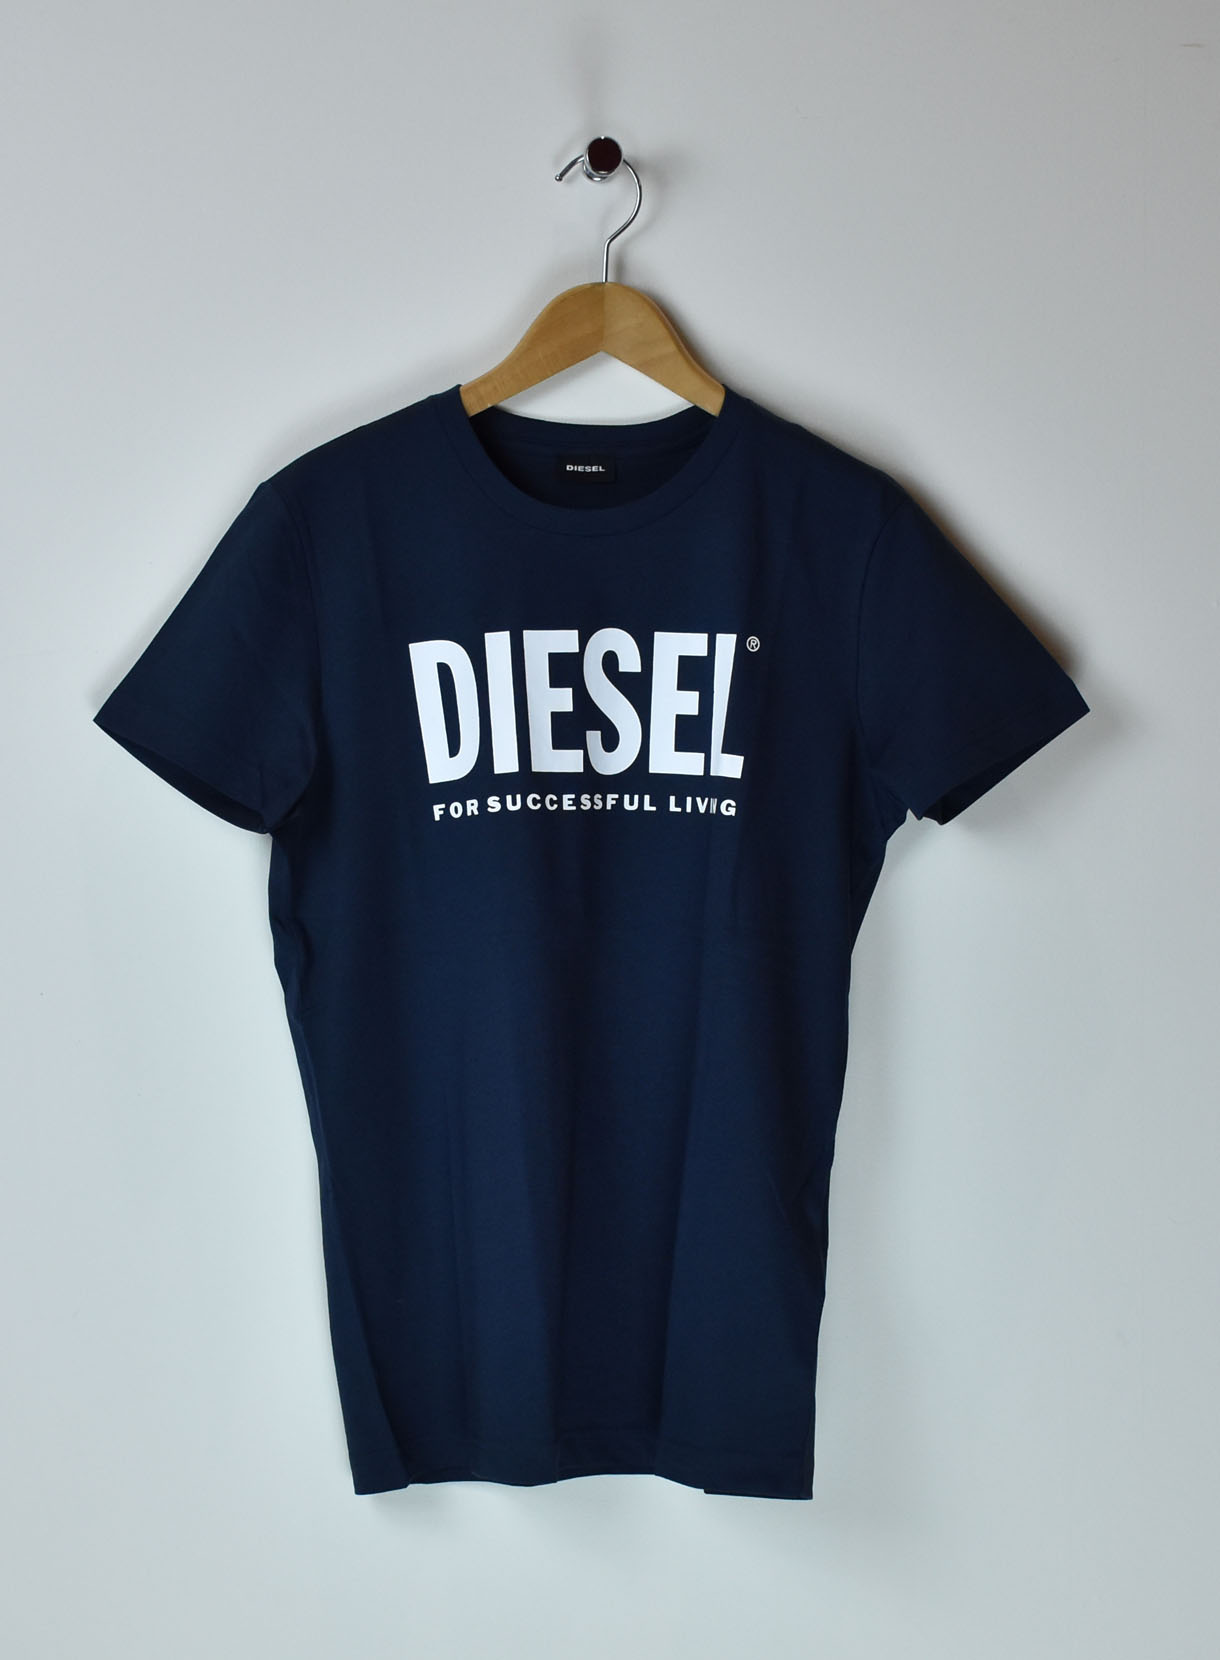 DIESEL シンプルグラフィックTシャツ